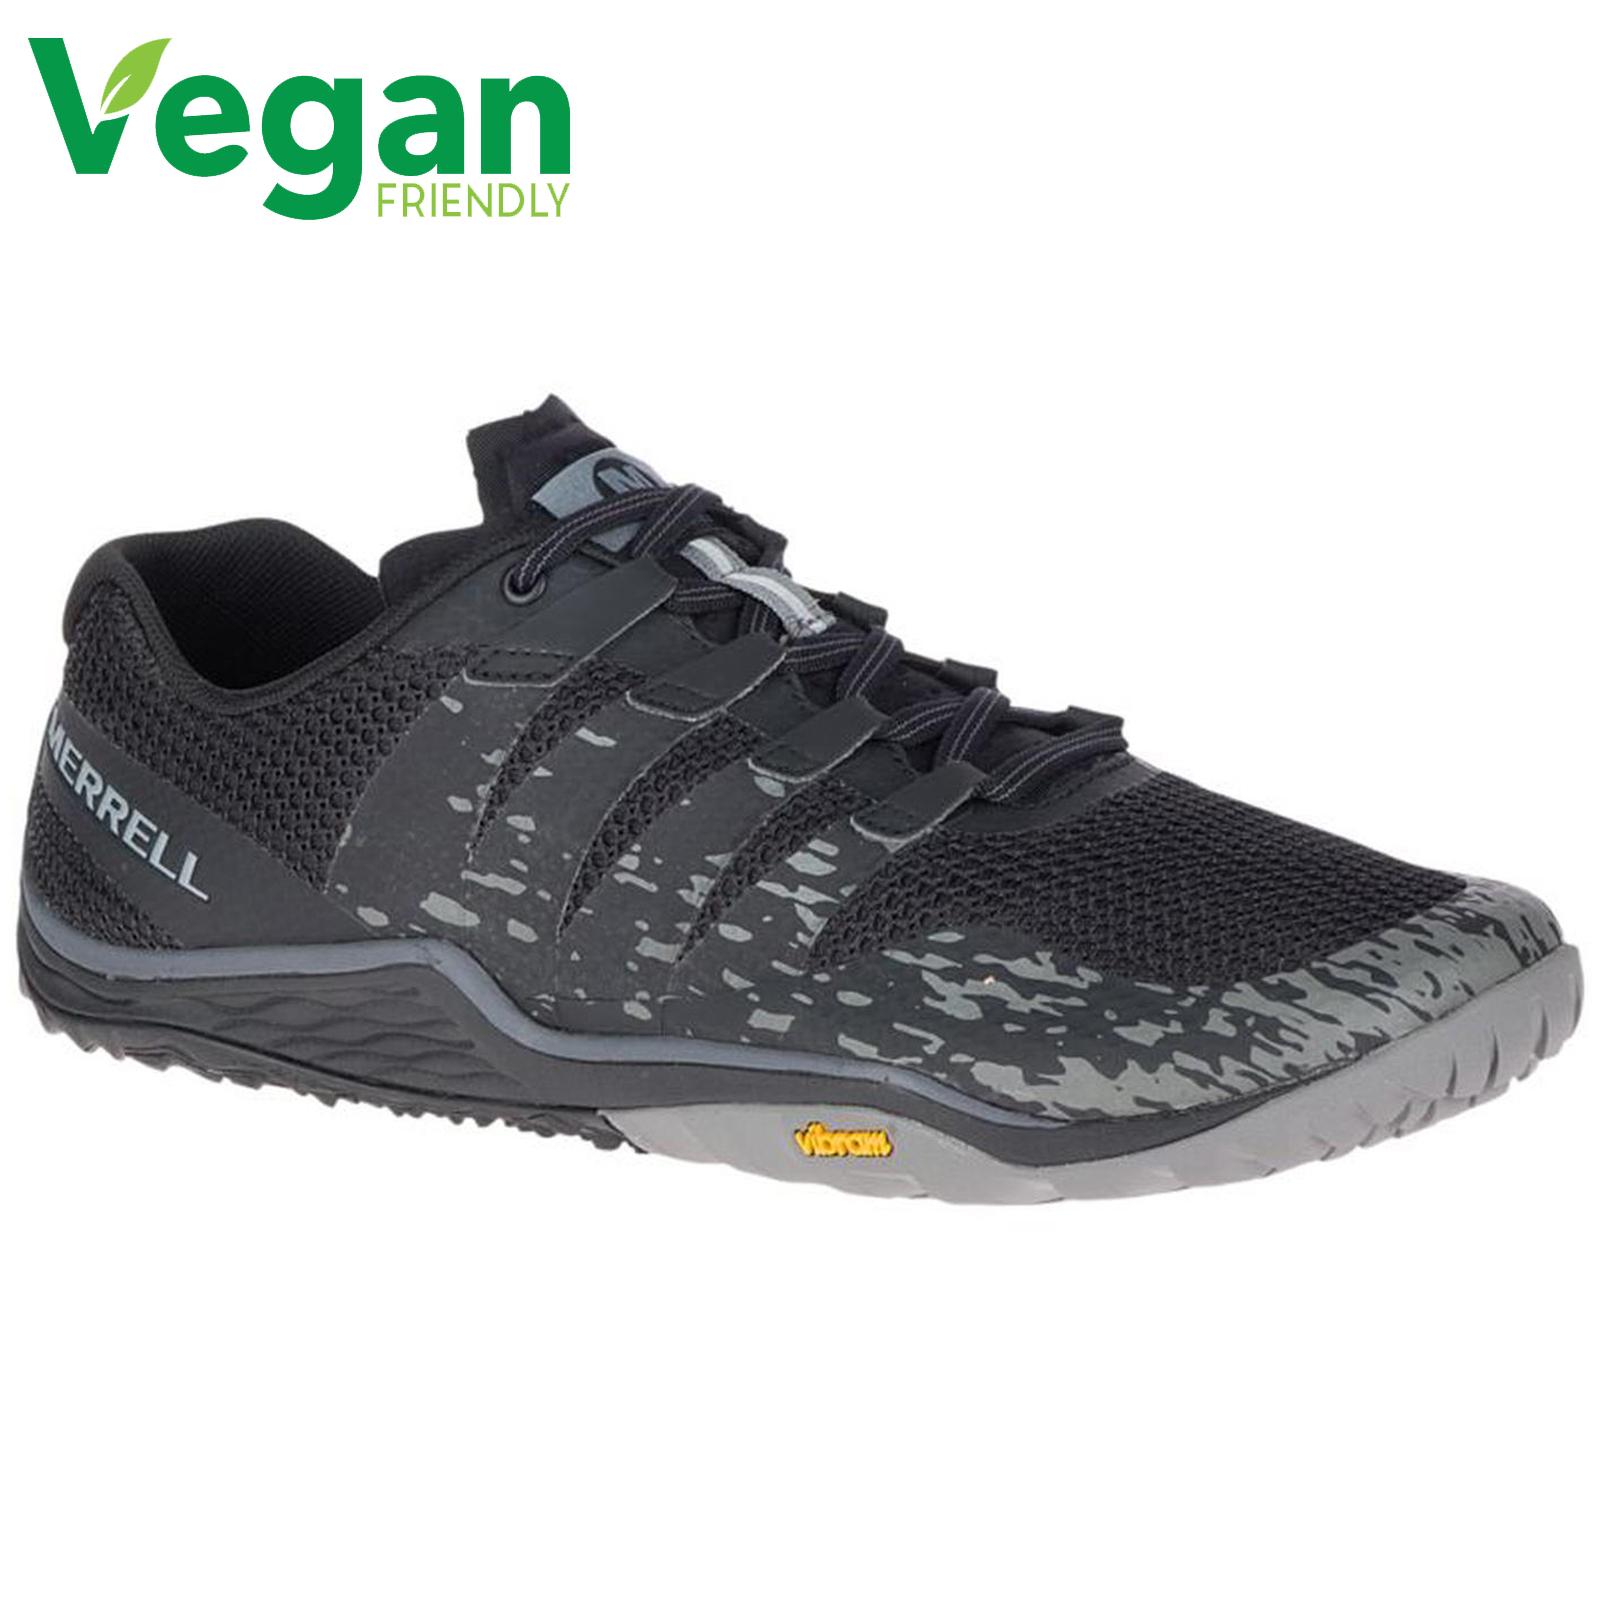 Merrell Trail Glove 5 Da Uomo Vegan